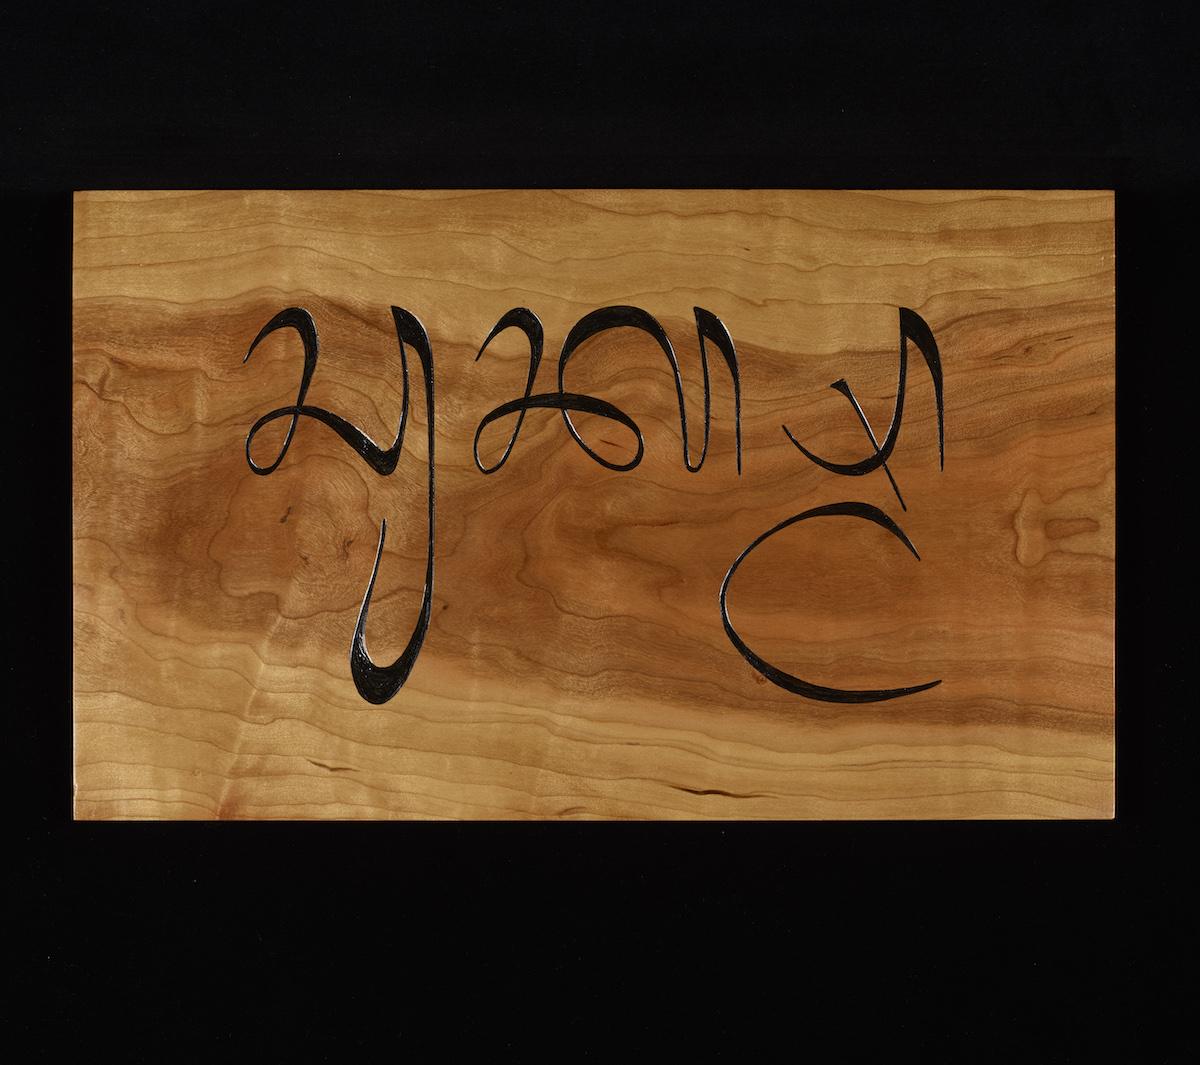 'Suksma' carving - 'Thank you' in Balinese.